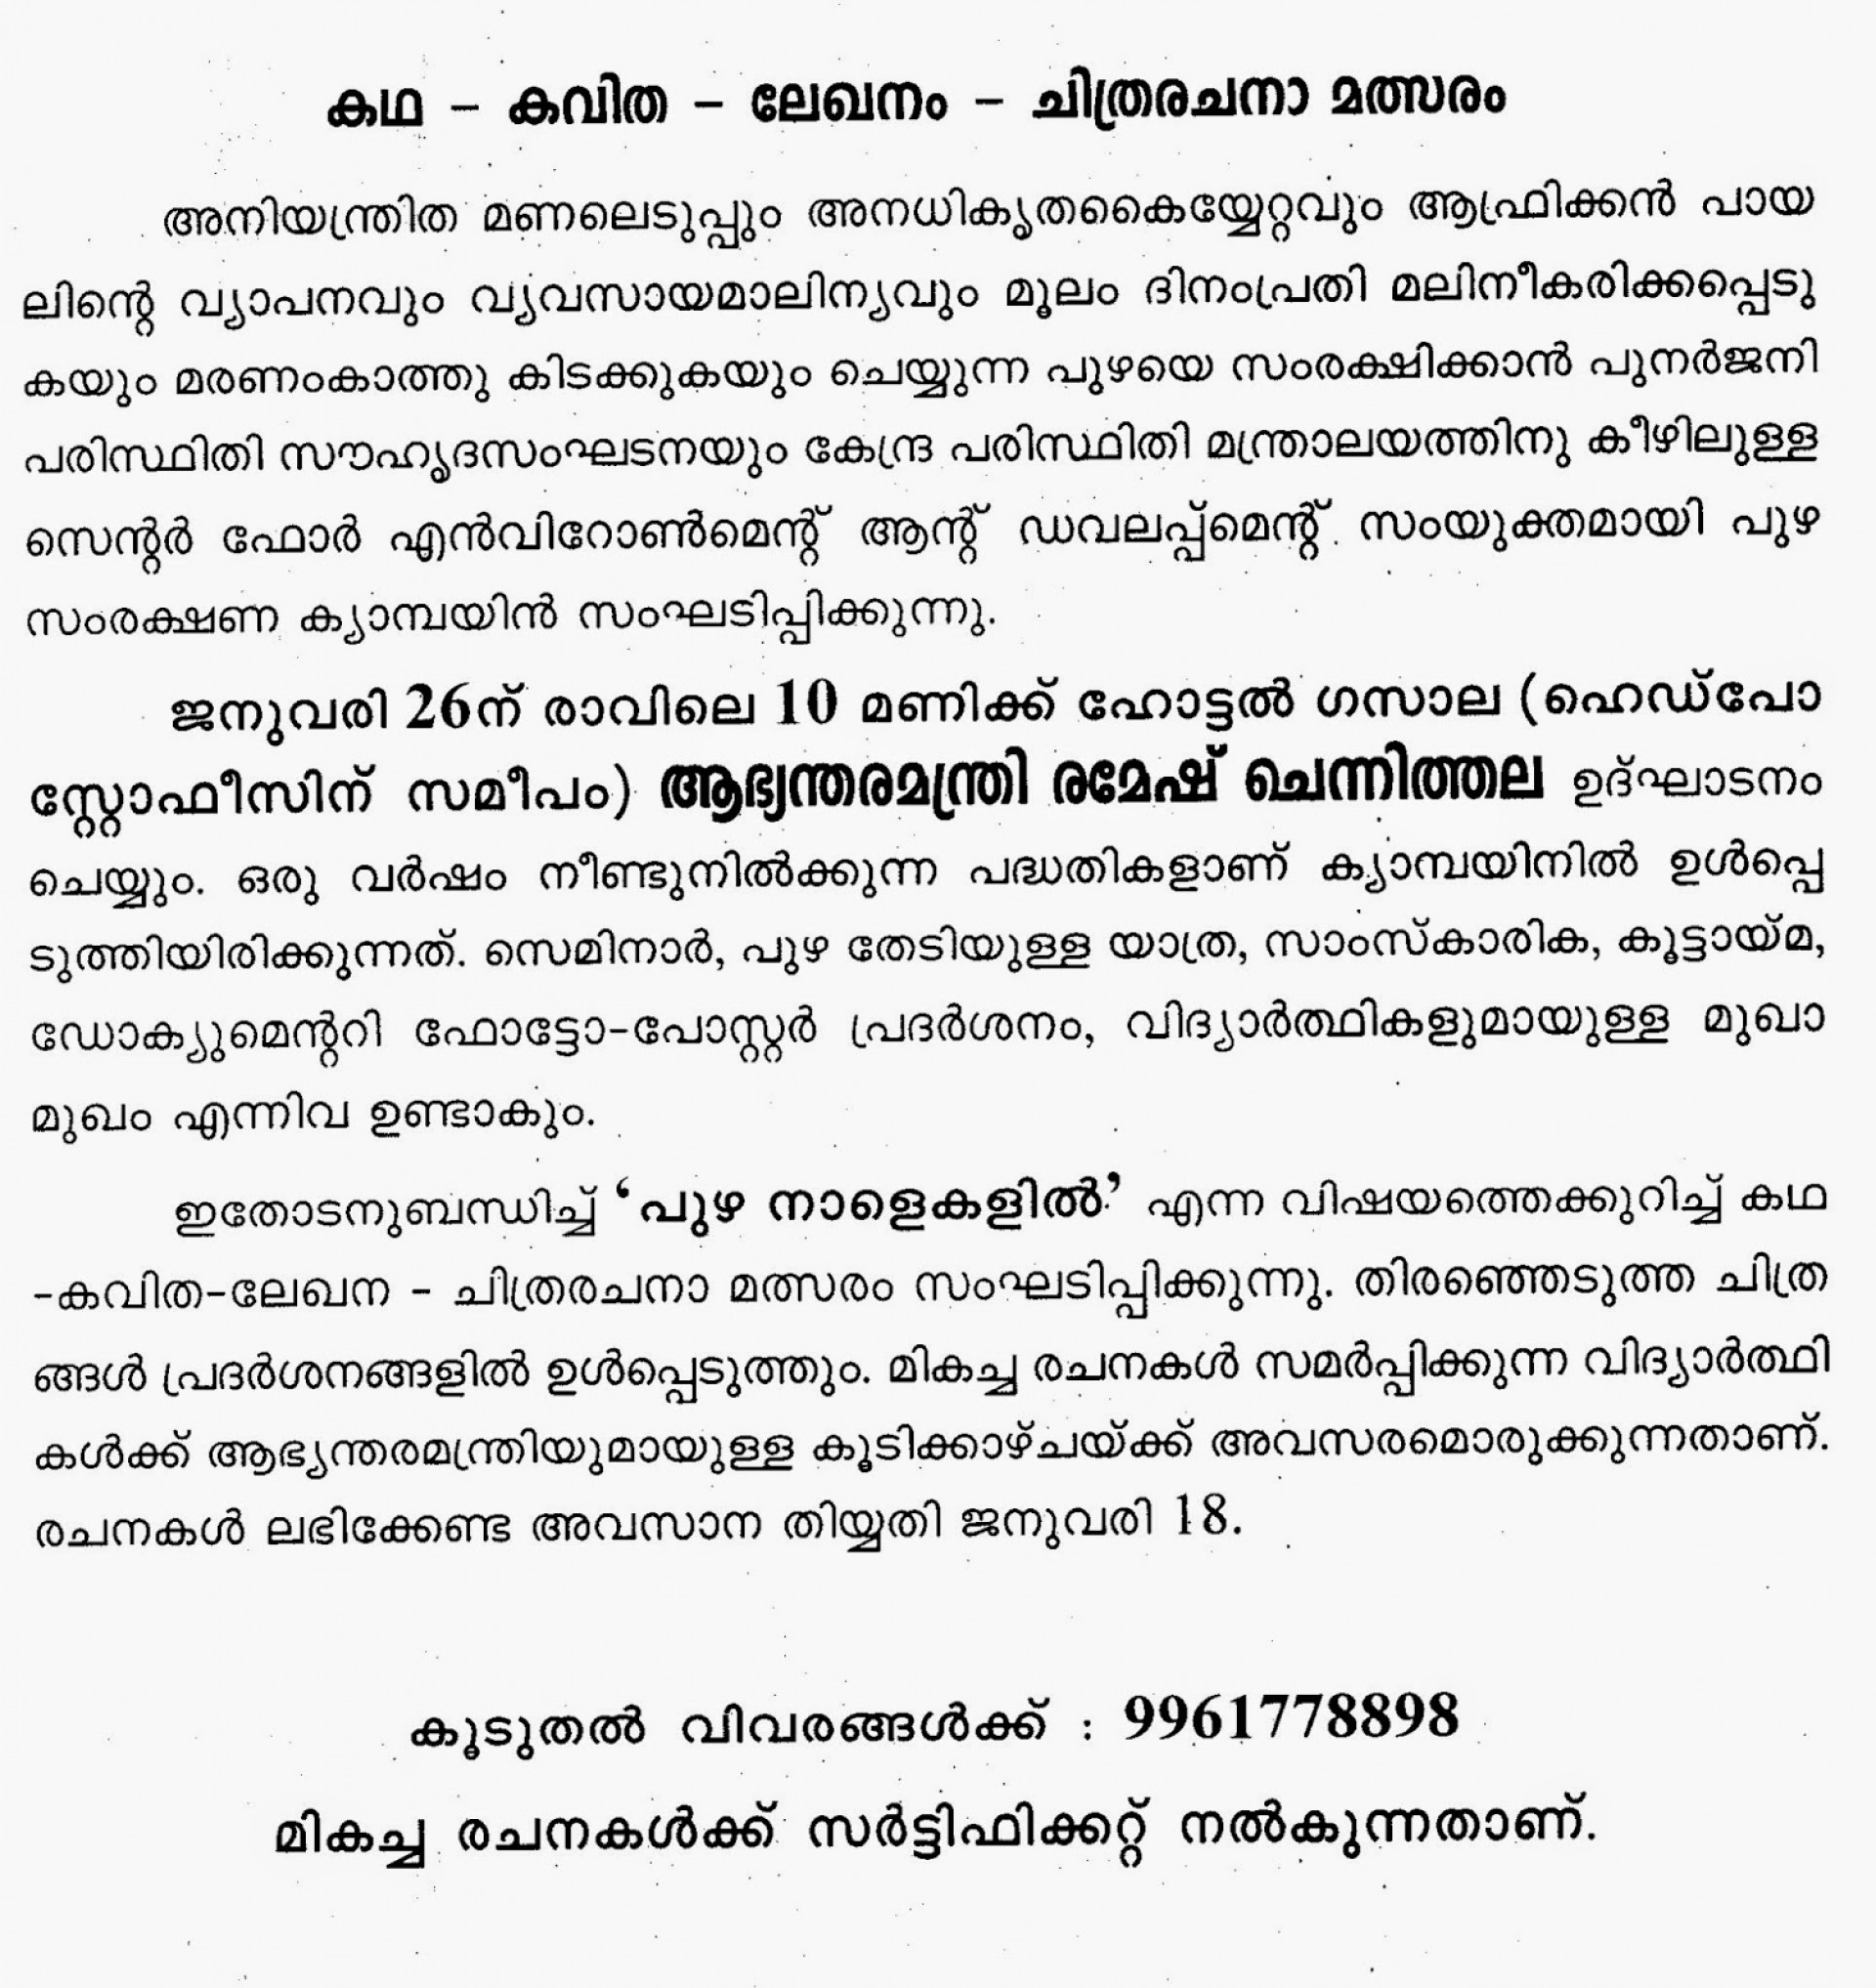 027 1342800675 Essay On Importance Of Water In Hindi Makar Sankranti Surprising Pdf Download 2018 1920